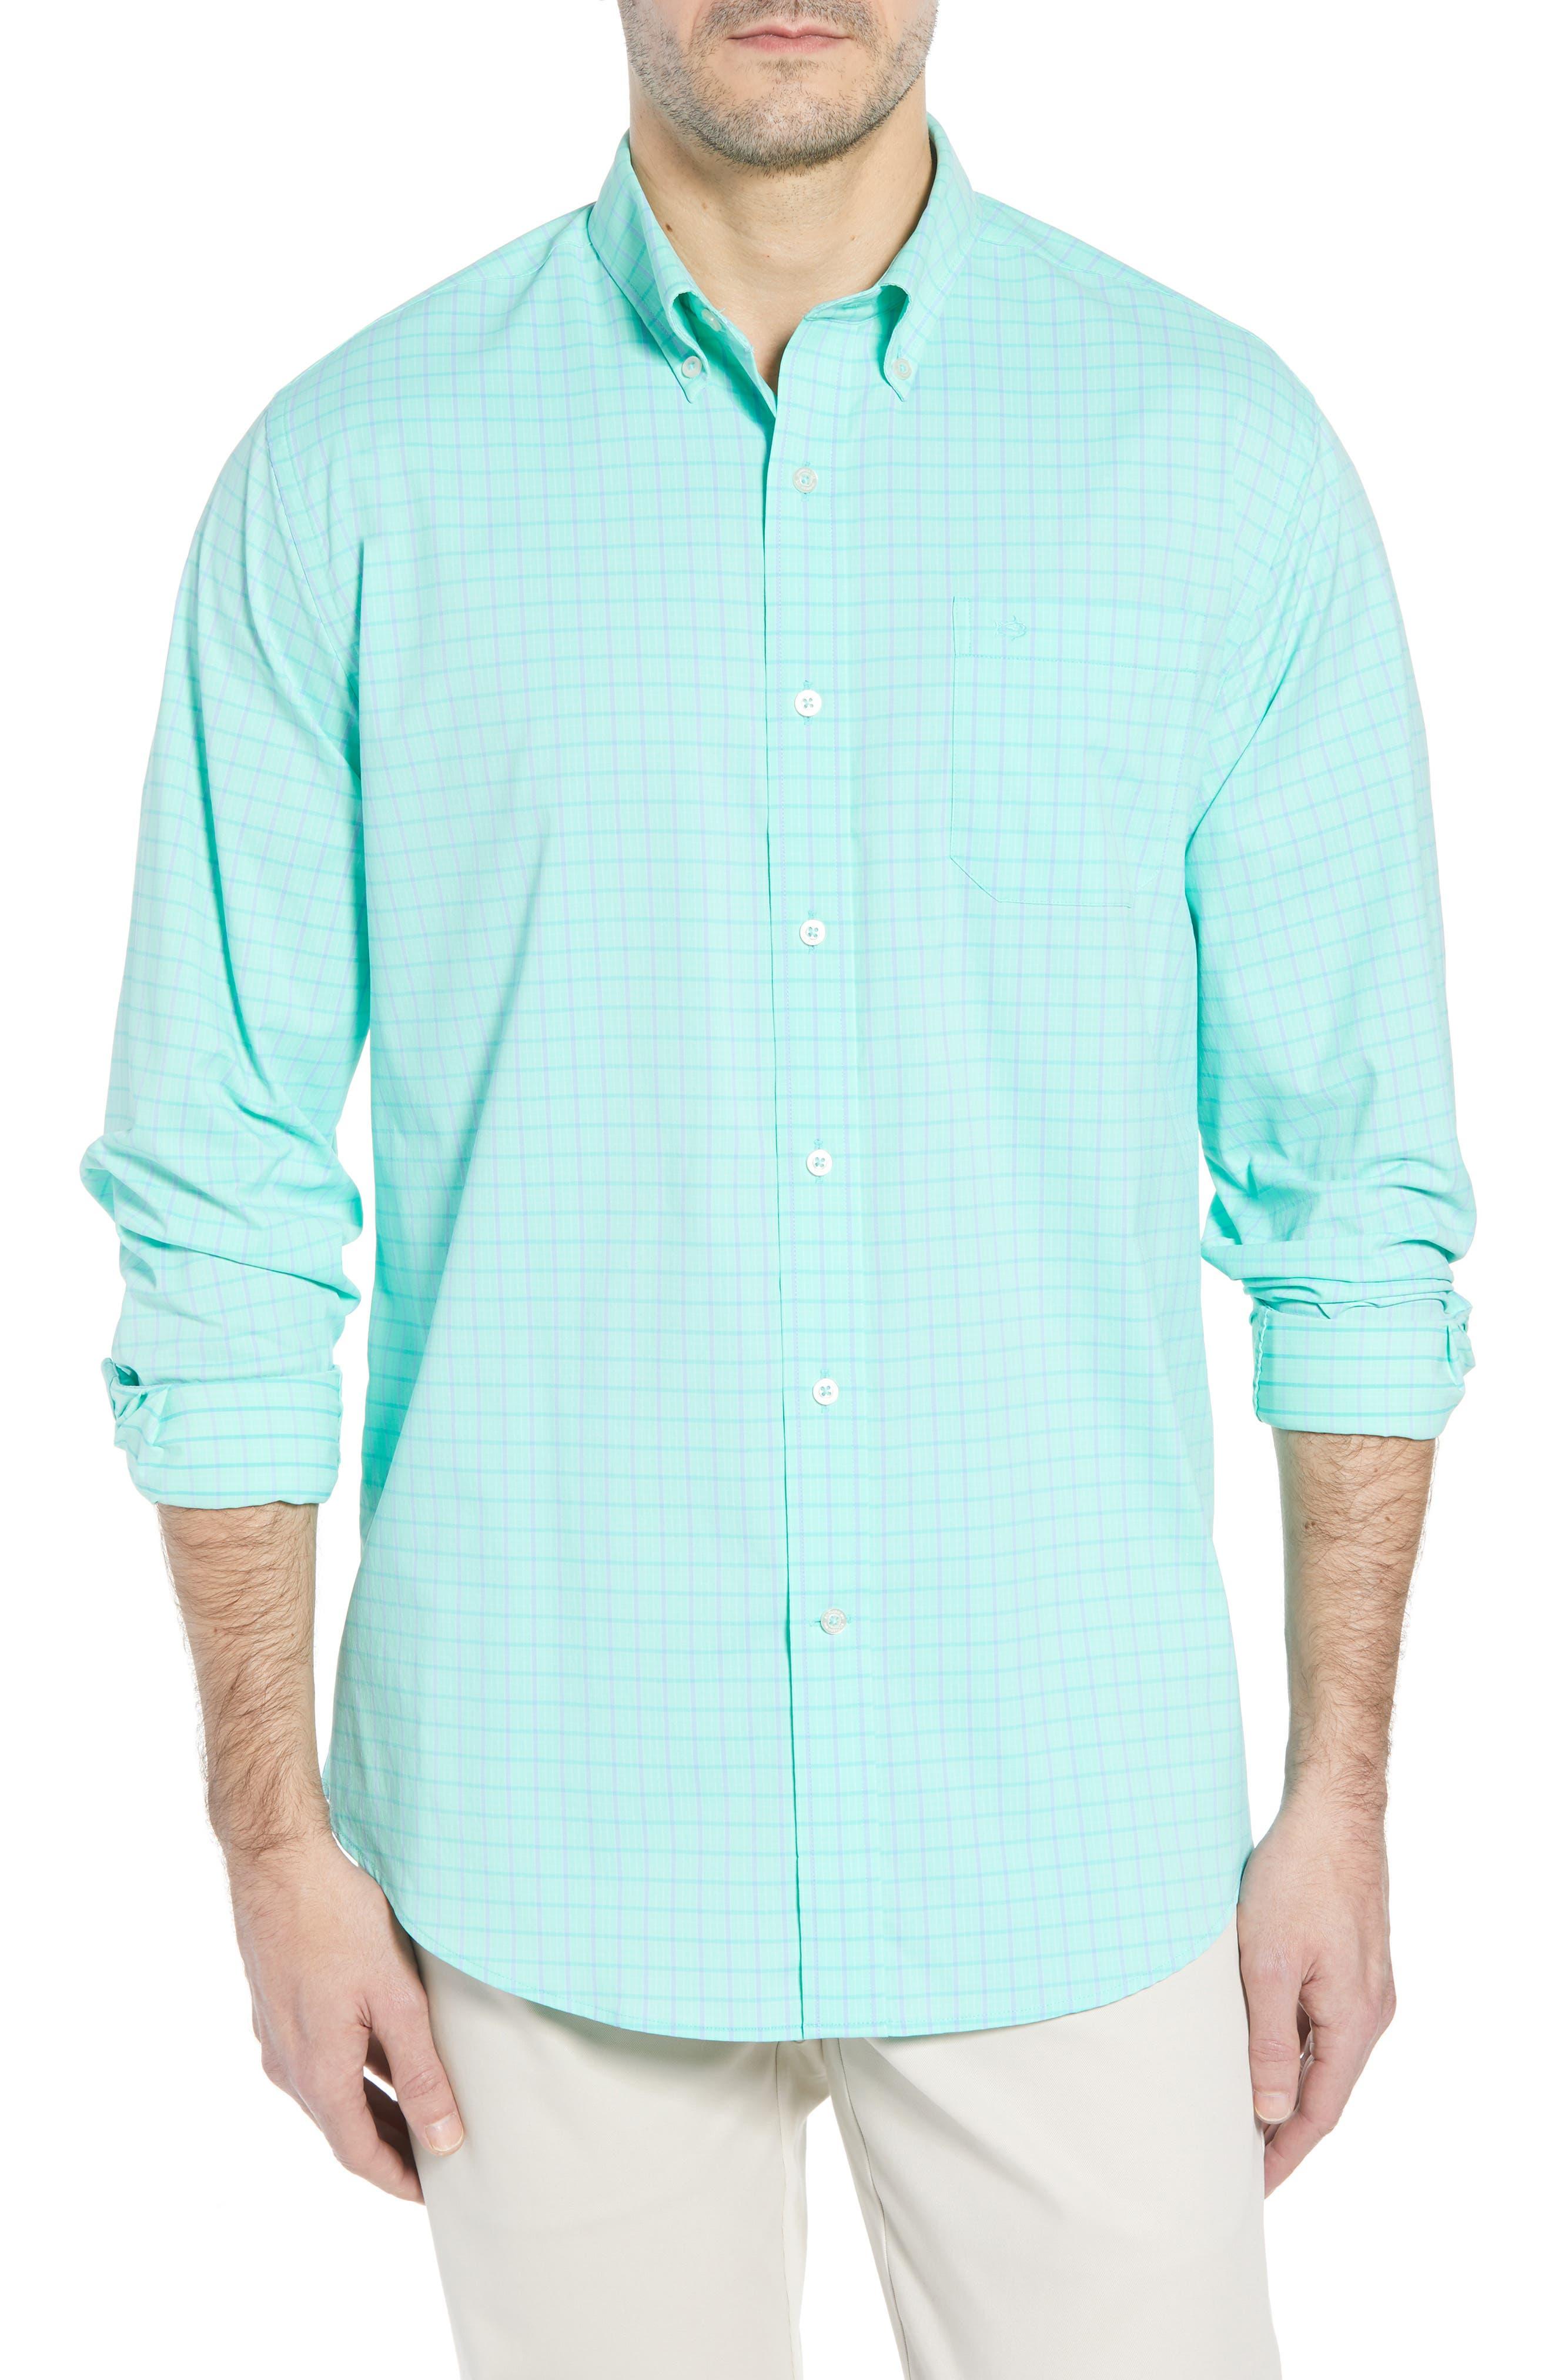 Intercoastal Gordia Plaid Sport Shirt,                         Main,                         color,